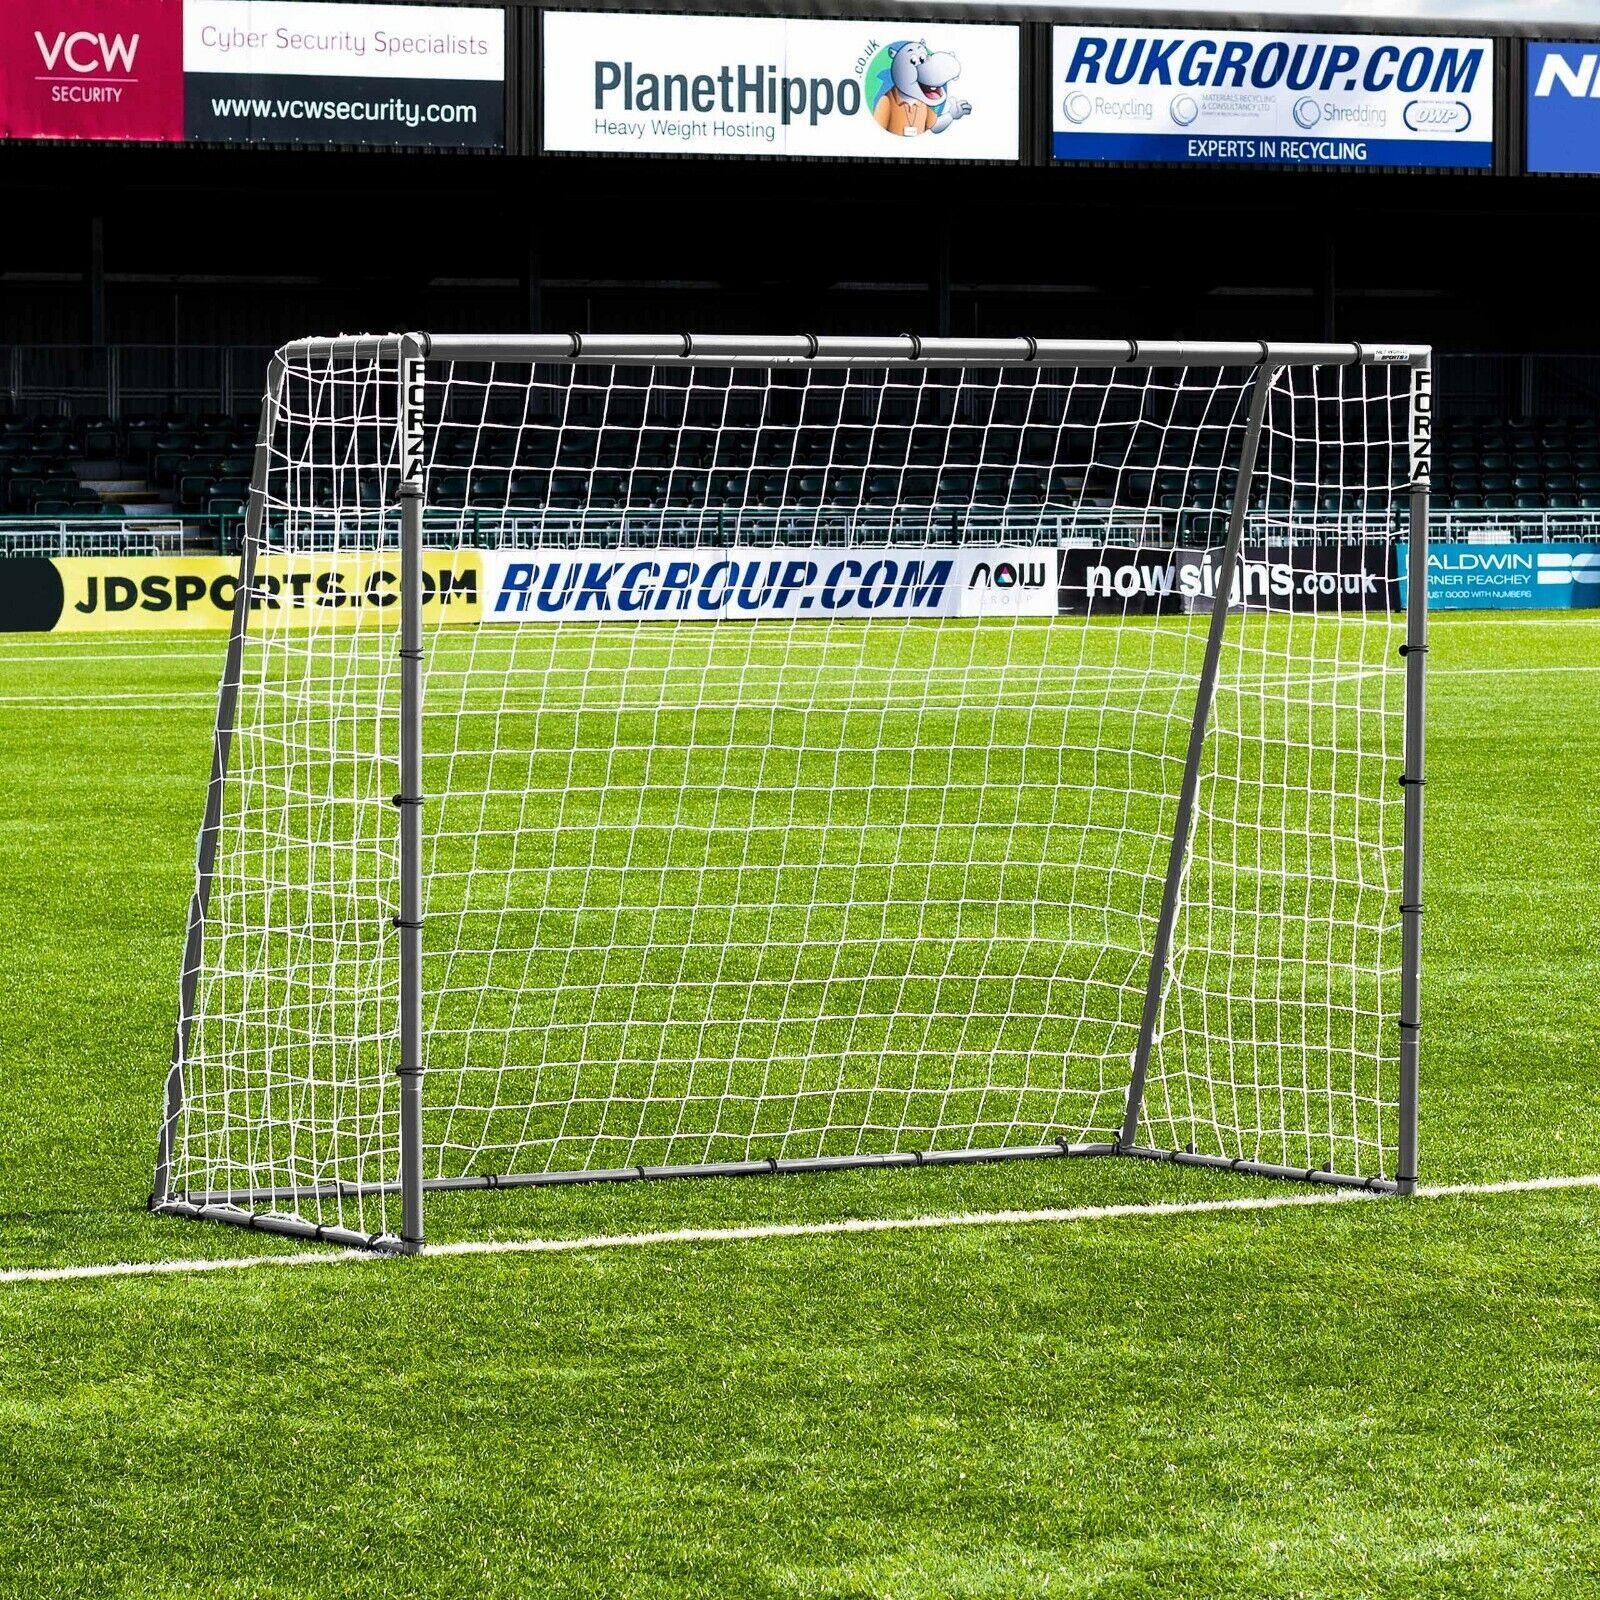 Forza Acero 42 objetivo de fútbol   8 ft (approx. 2.44 m) X 6 ft (approx. 1.83 m)   Acero Juniors meta   objetivo y Net